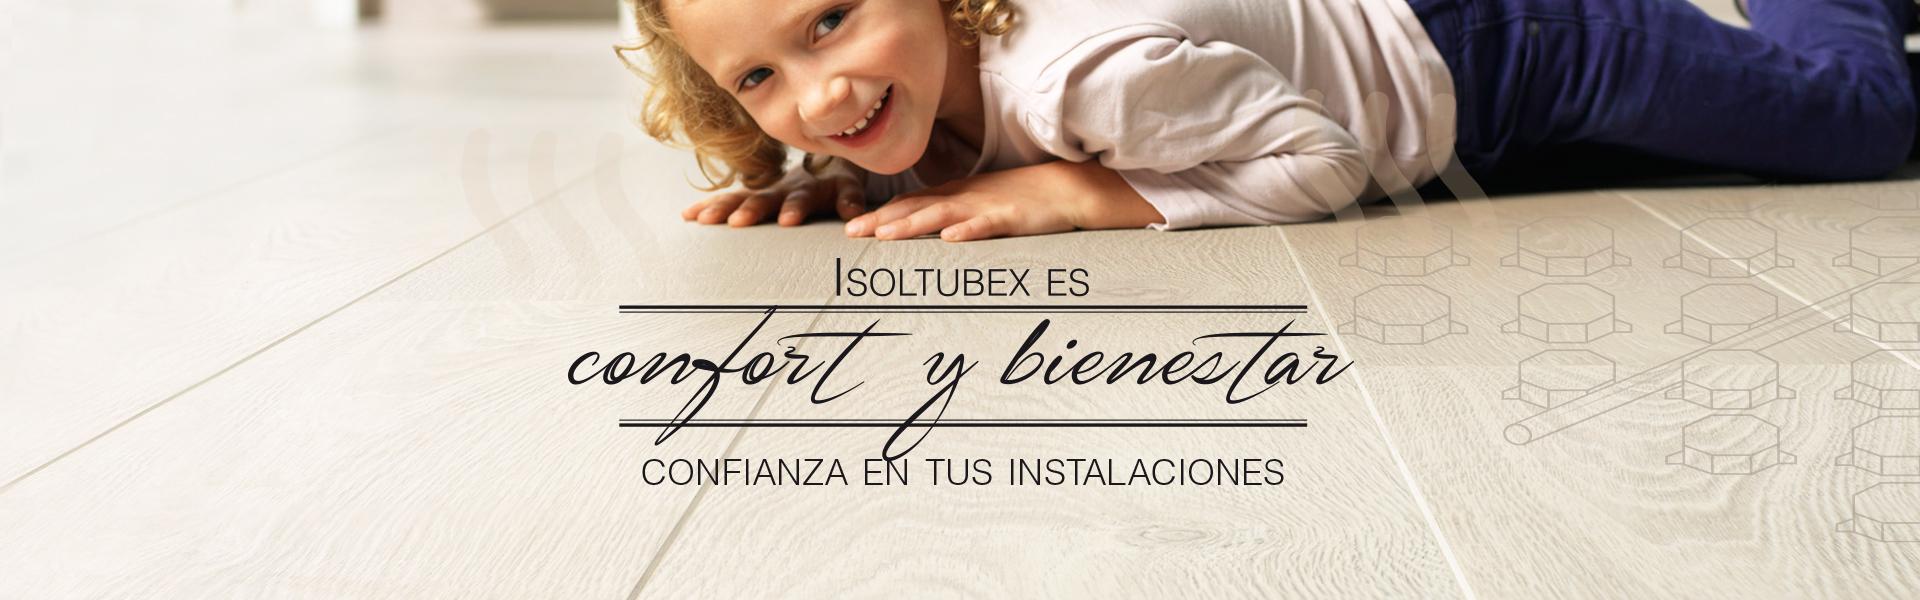 Confort y Bienestar - Isoltubex